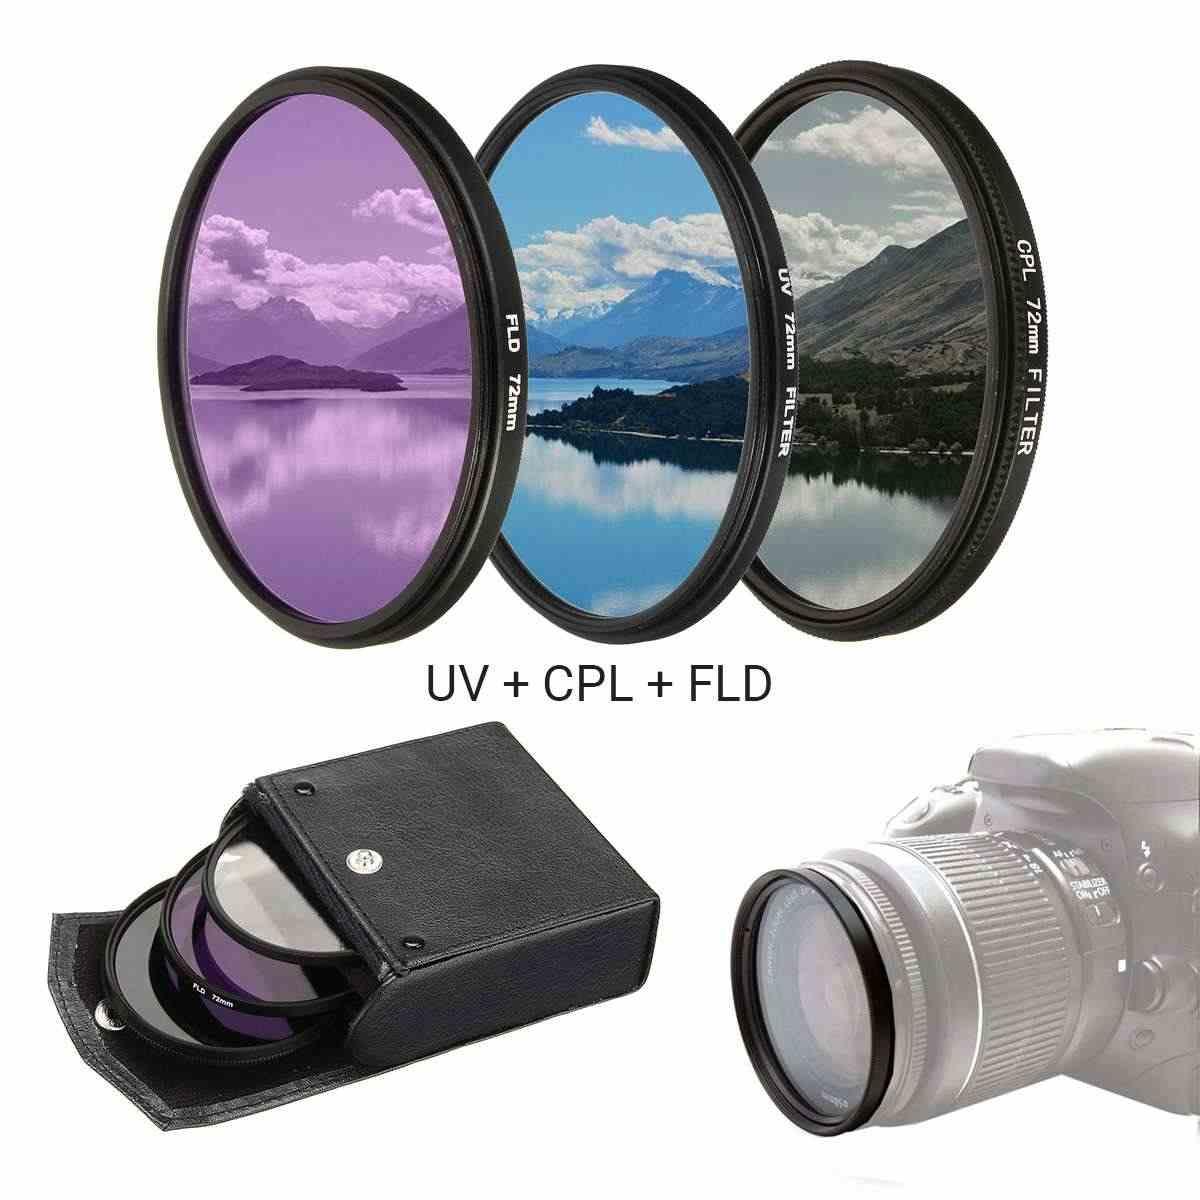 49 ミリメートル 52 ミリメートル 55 ミリメートル 58 ミリメートル 62 ミリメートル 67 ミリメートル 72 ミリメートル 77 ミリメートル UV + CPL + FLD で 3 1 レンズとセットでソニーキャノンカメラレンズ